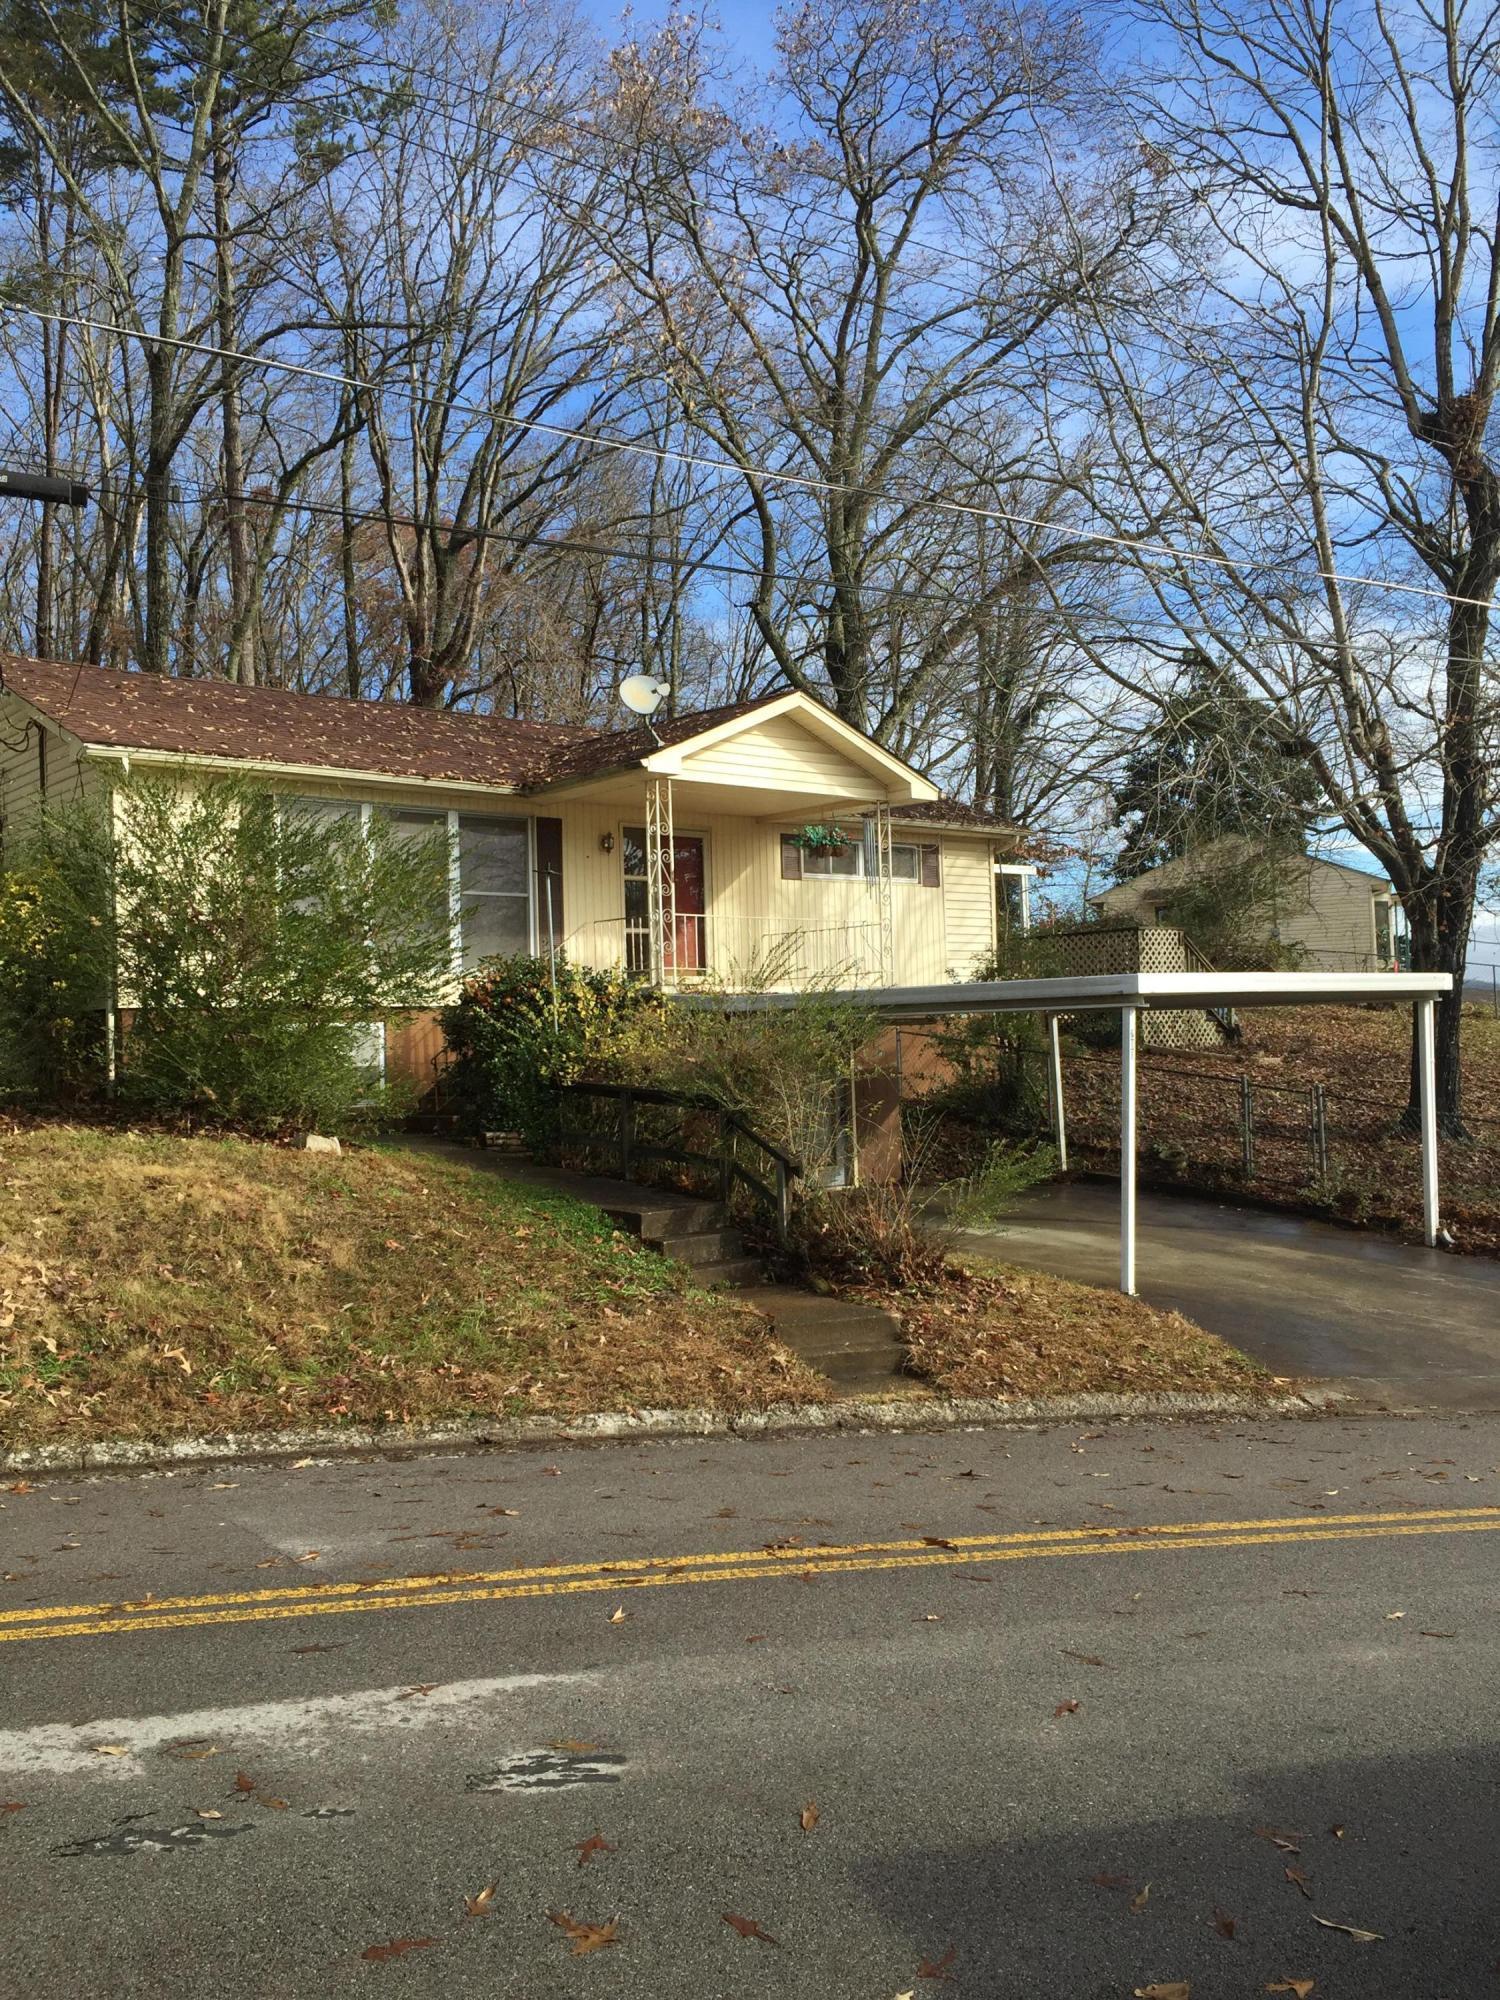 200 Alhambra Rd, Oak Ridge, TN 37830